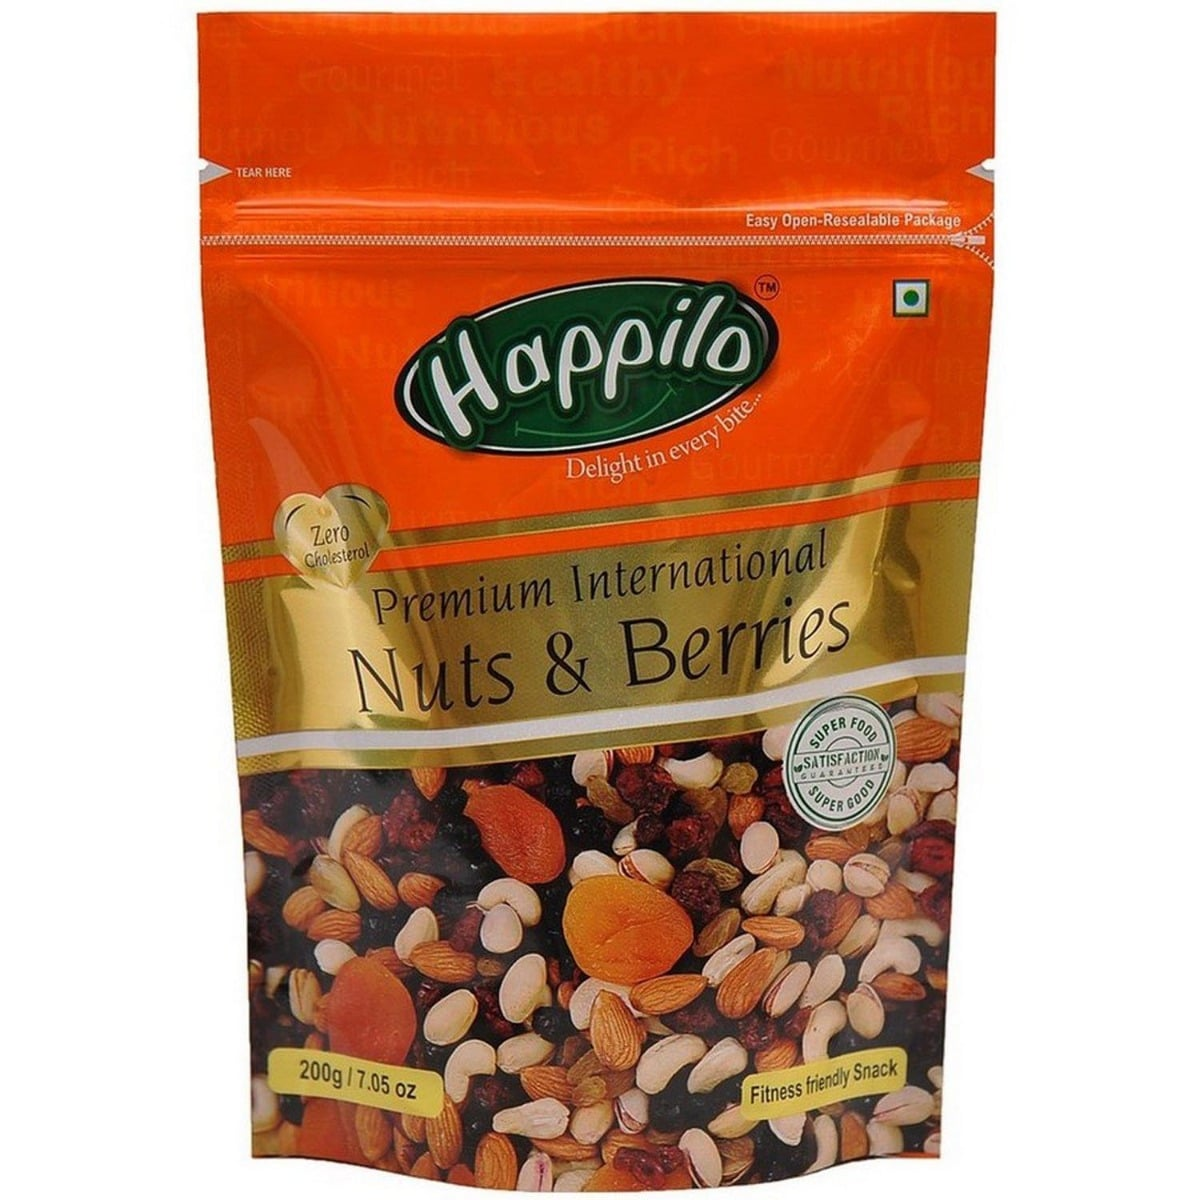 Happilo Premium International Nuts & Berries, 200 gm, Pack of 1